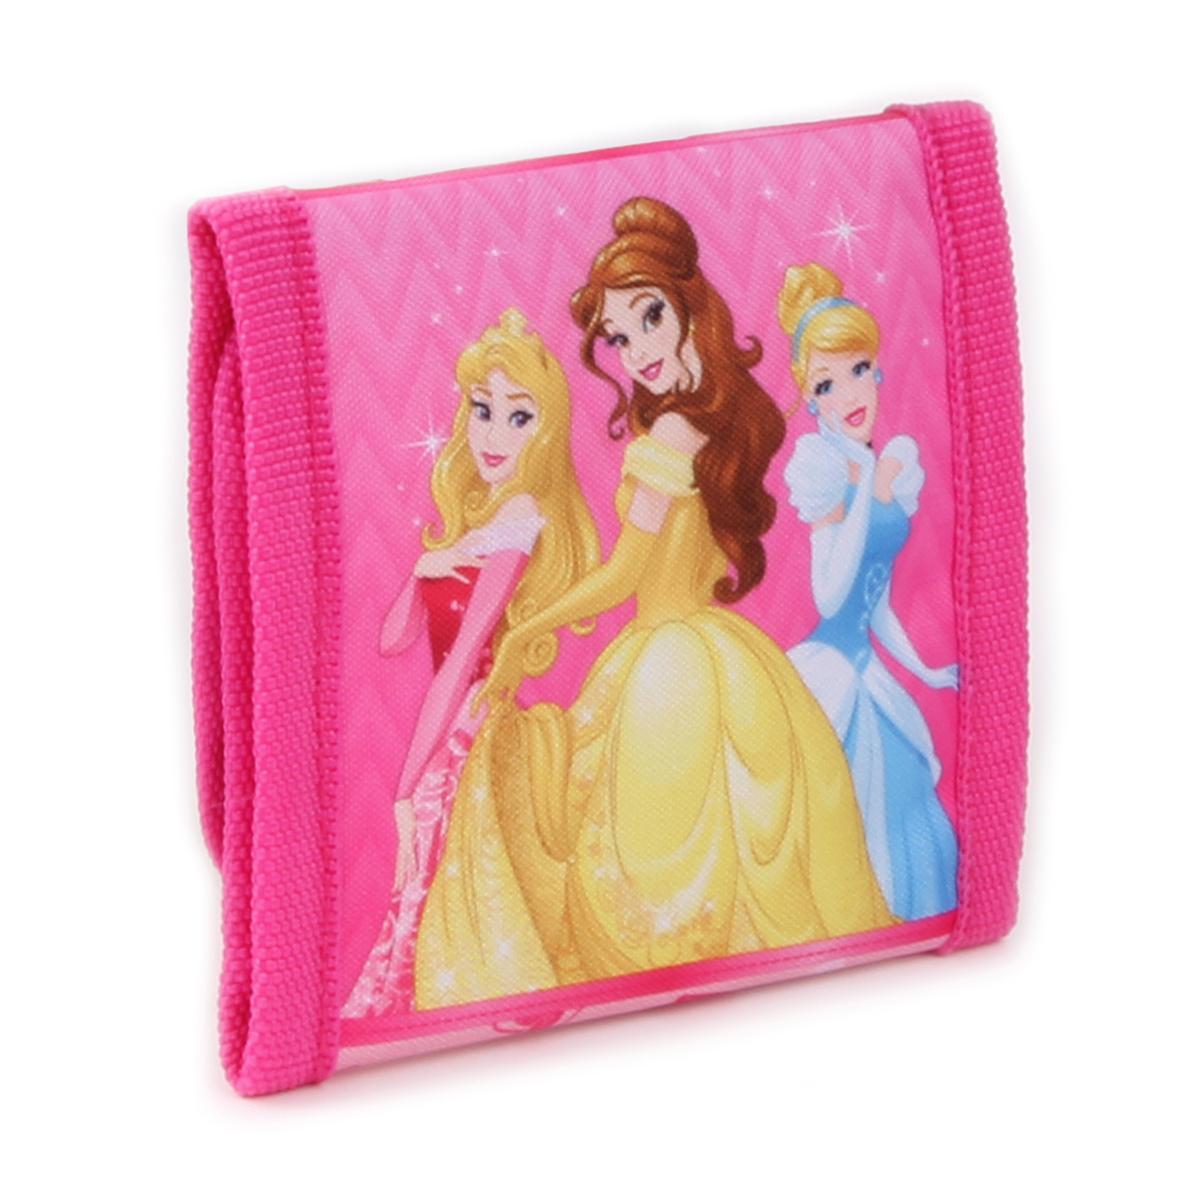 Portefeuille scratch \'Princesses Disney\' Rose - 10x10 cm - [A0112]